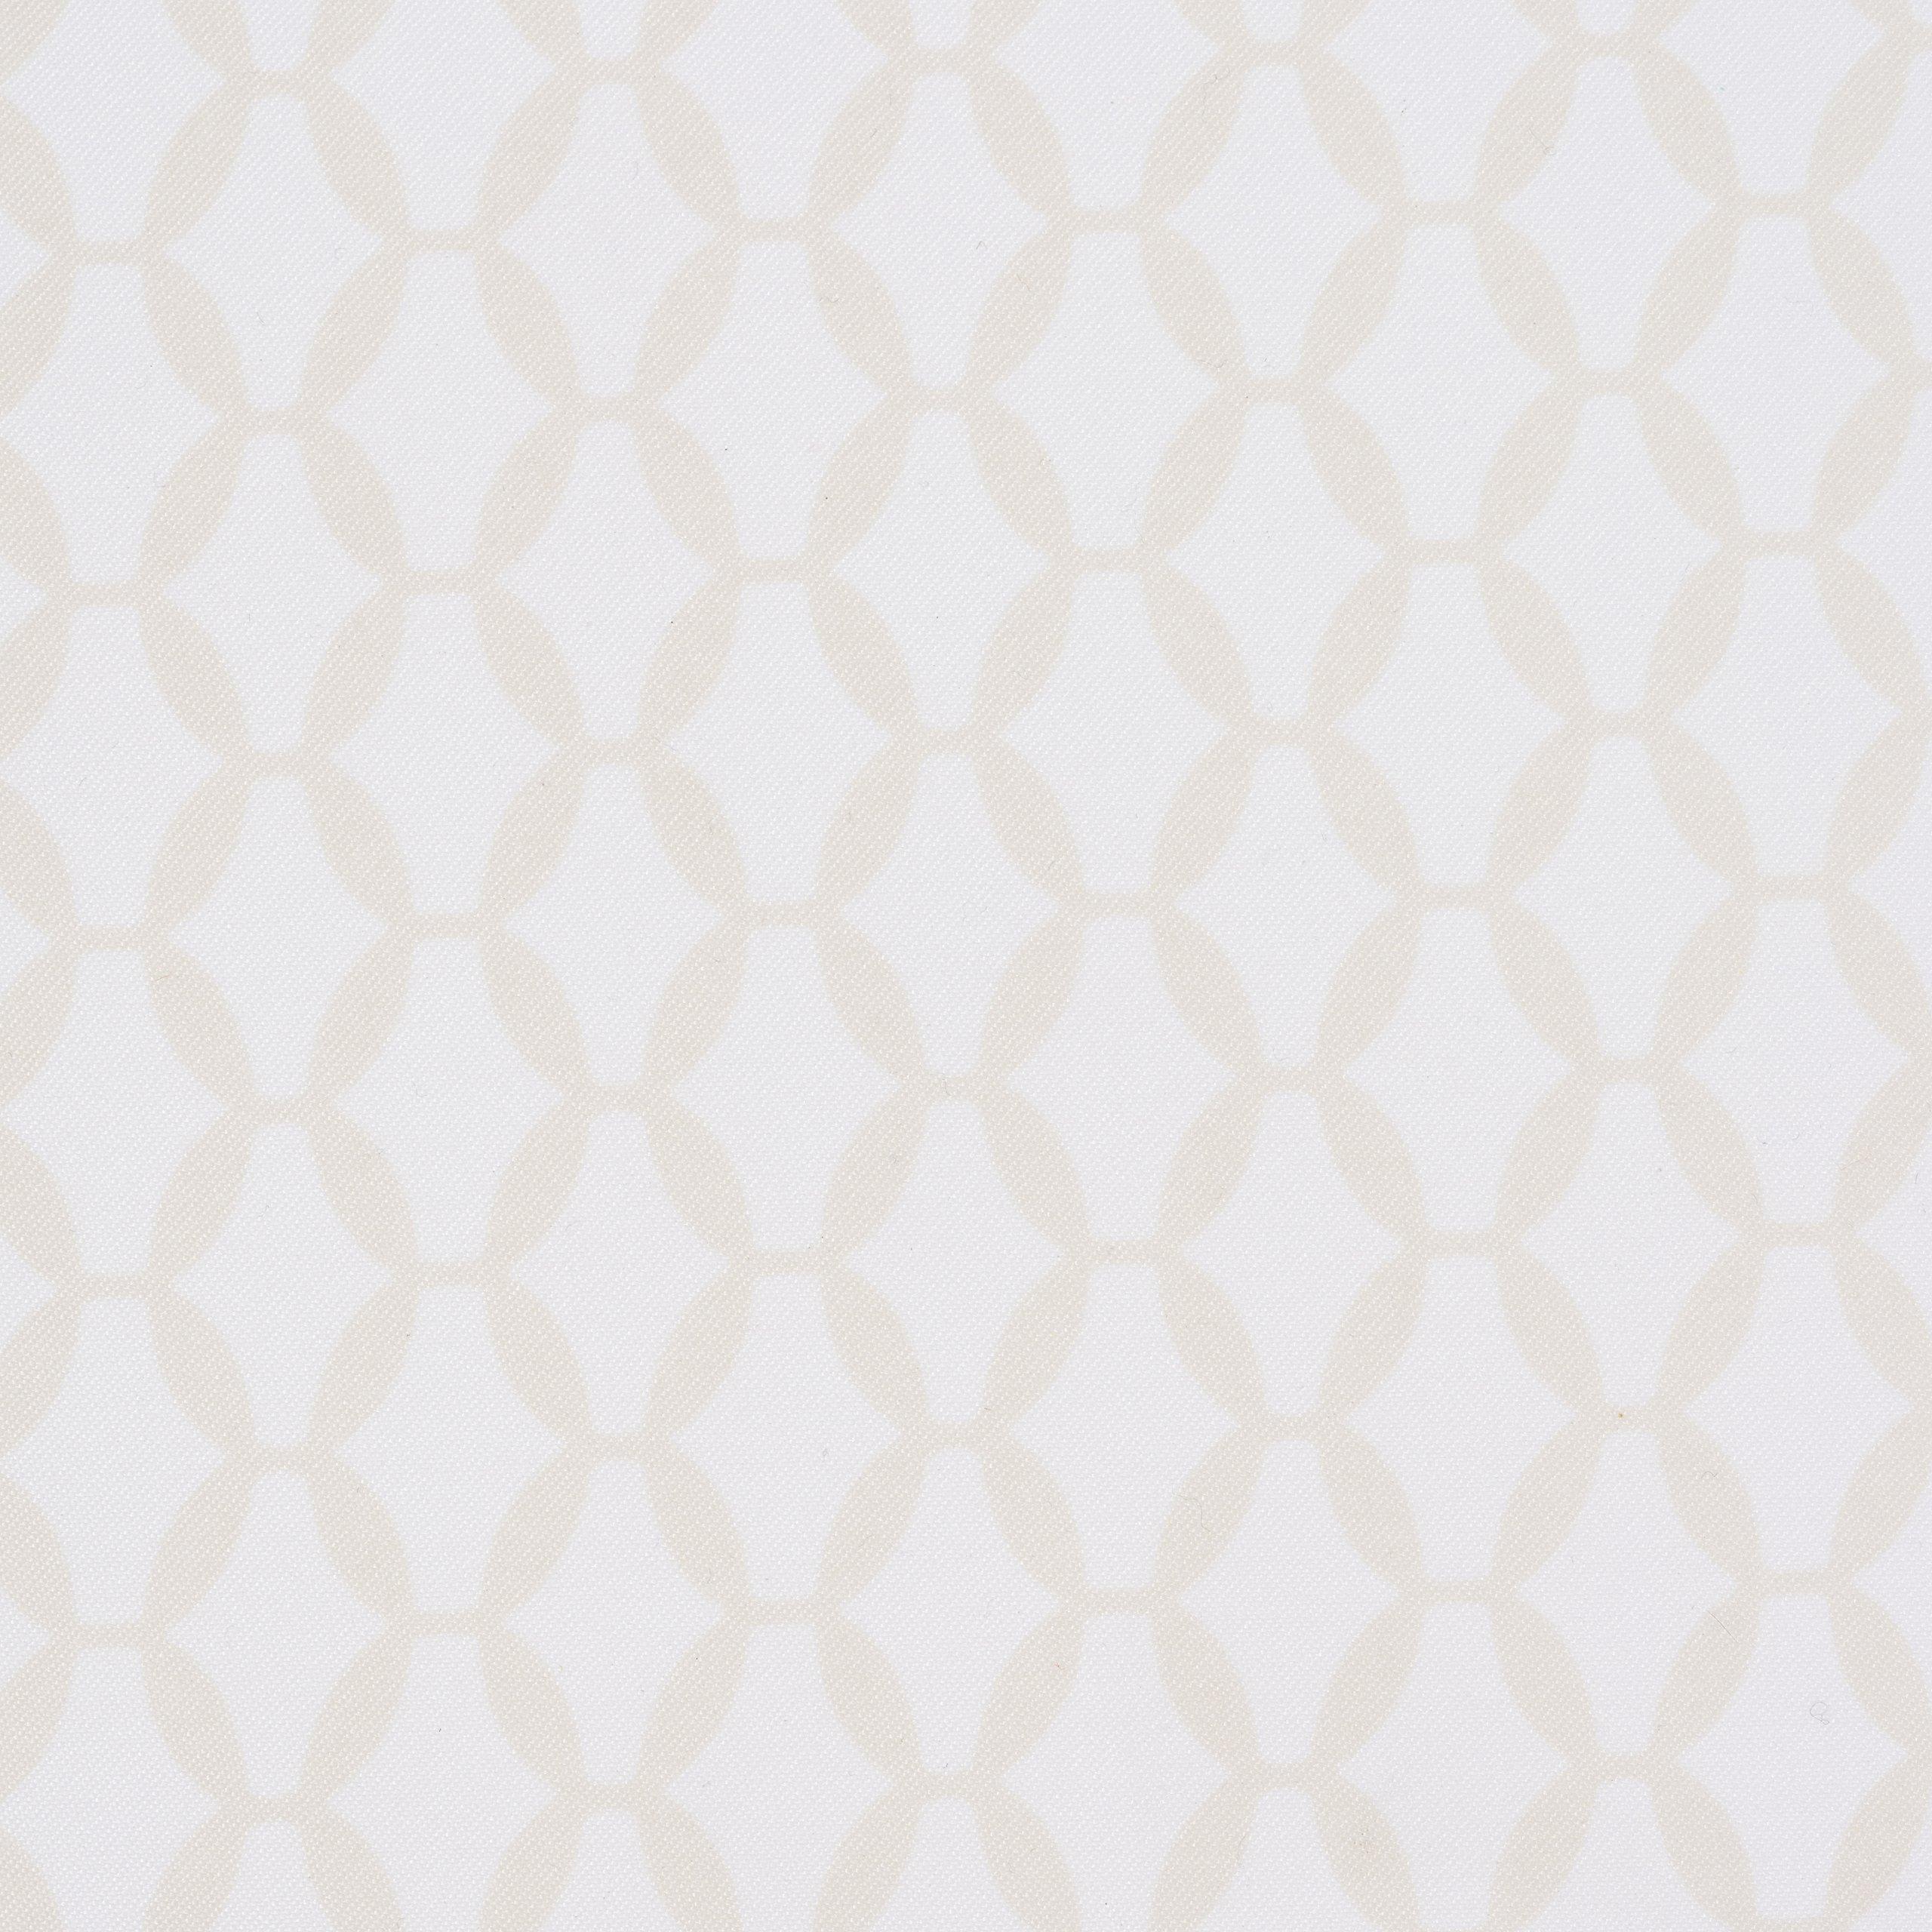 HALO Bassinest Swivel Sleeper Bassinet - Essentia Series, Honeycomb by Halo (Image #6)